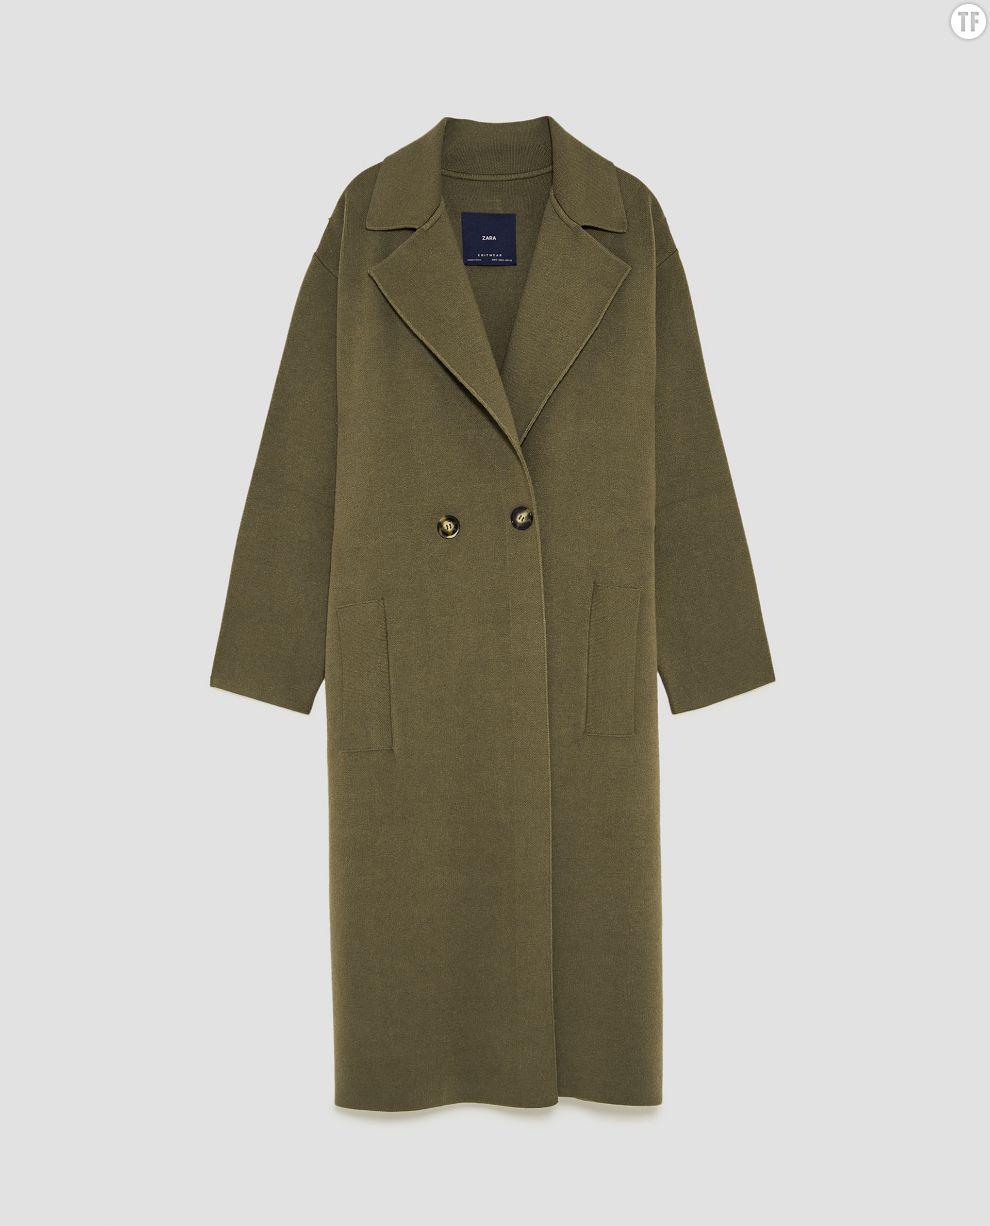 Manteau d'homme kaki Zara, 79,95€